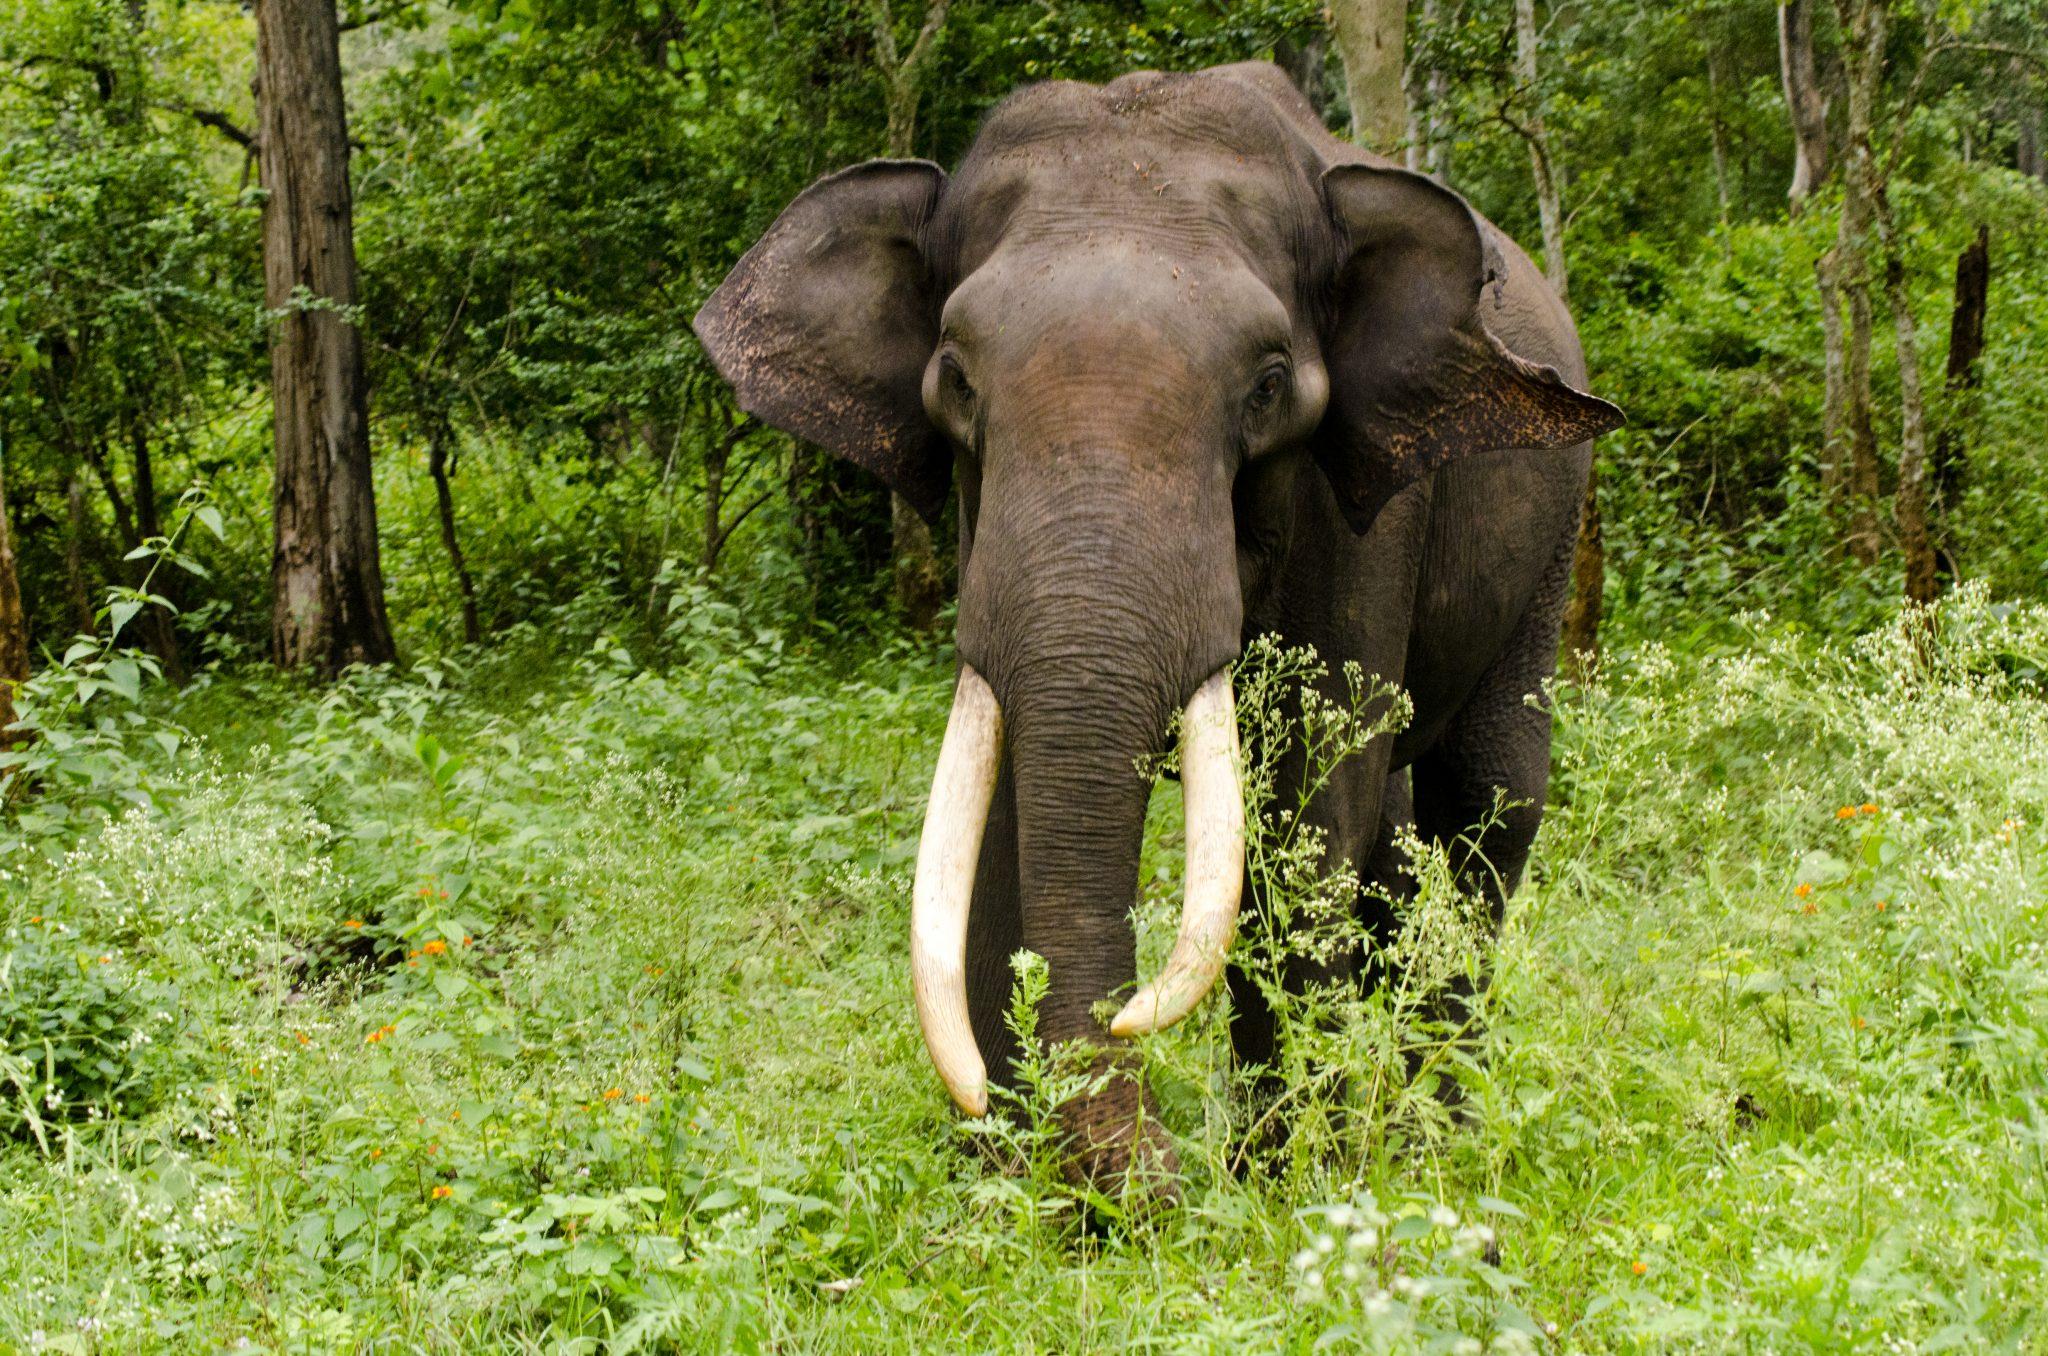 Asiatic elephant in Sri Lanka